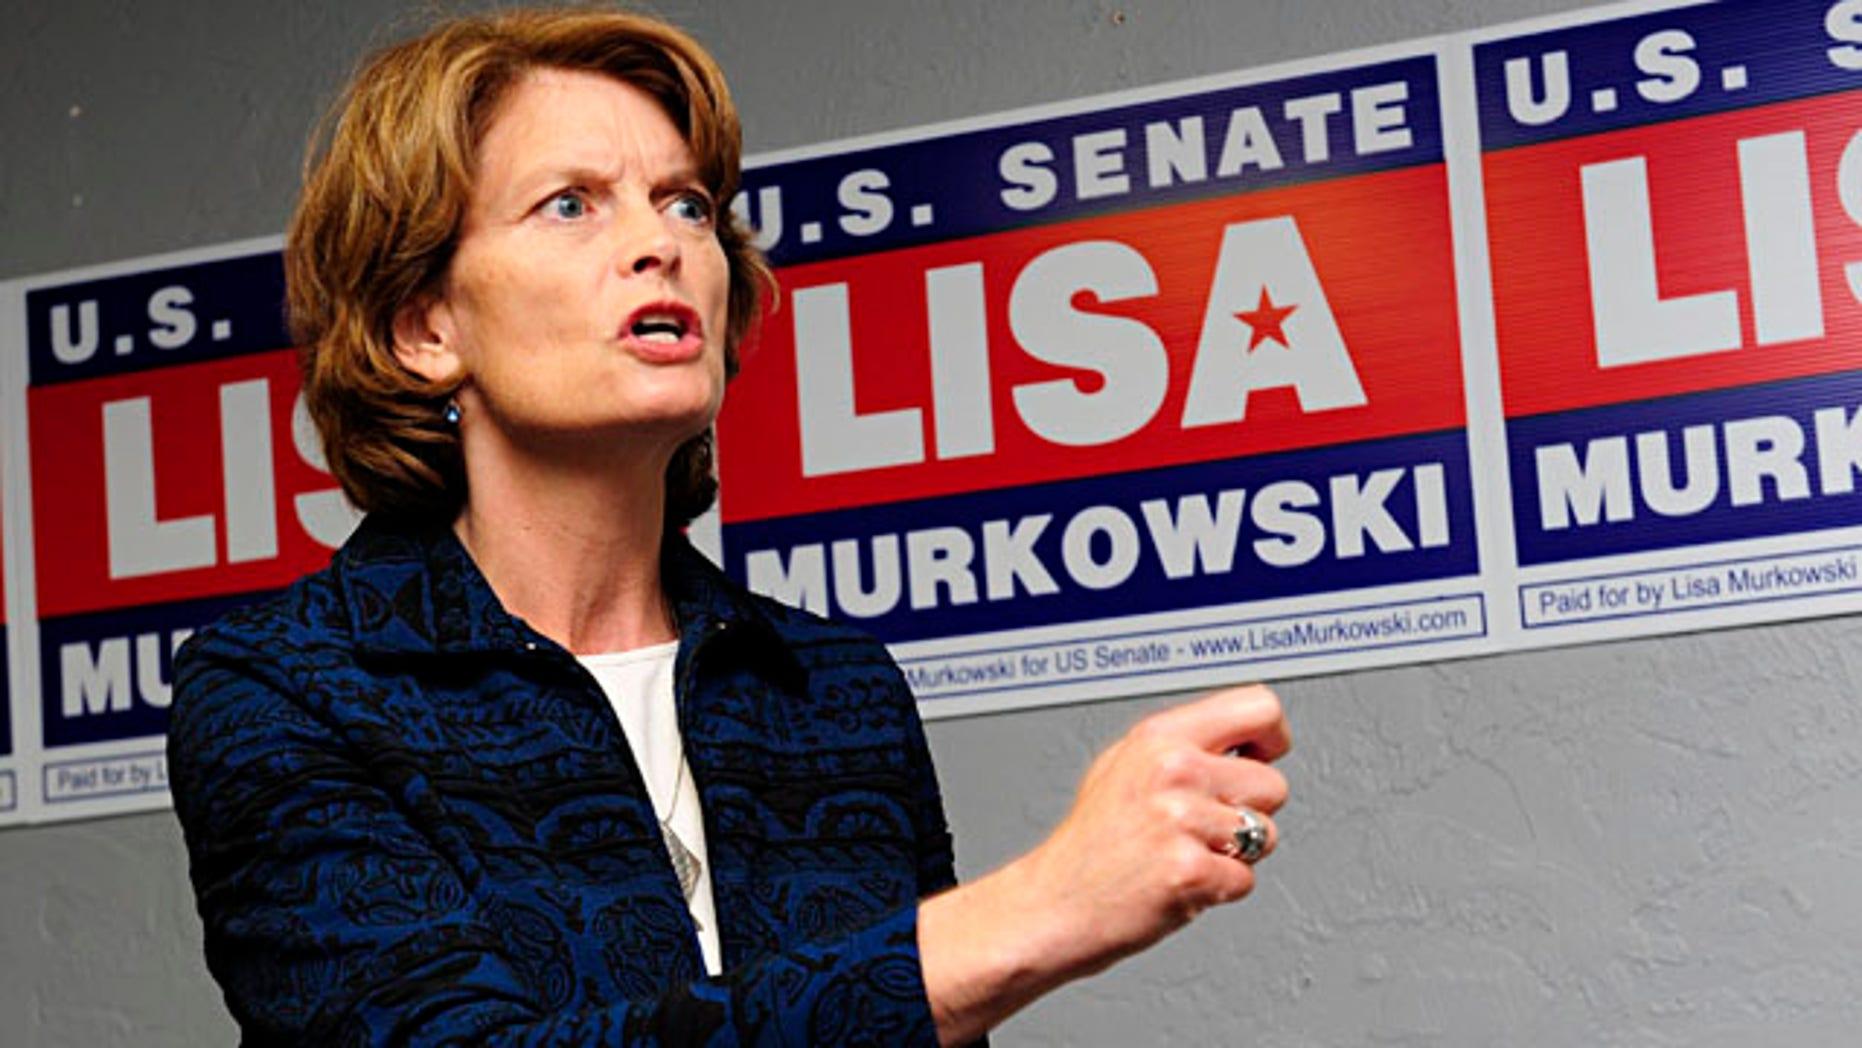 Sept. 24: Sen. Lisa Murkowski, R-Alaska, addresses a group of supporters at her new Juneau campaign headquarters in Juneau, Alaska.